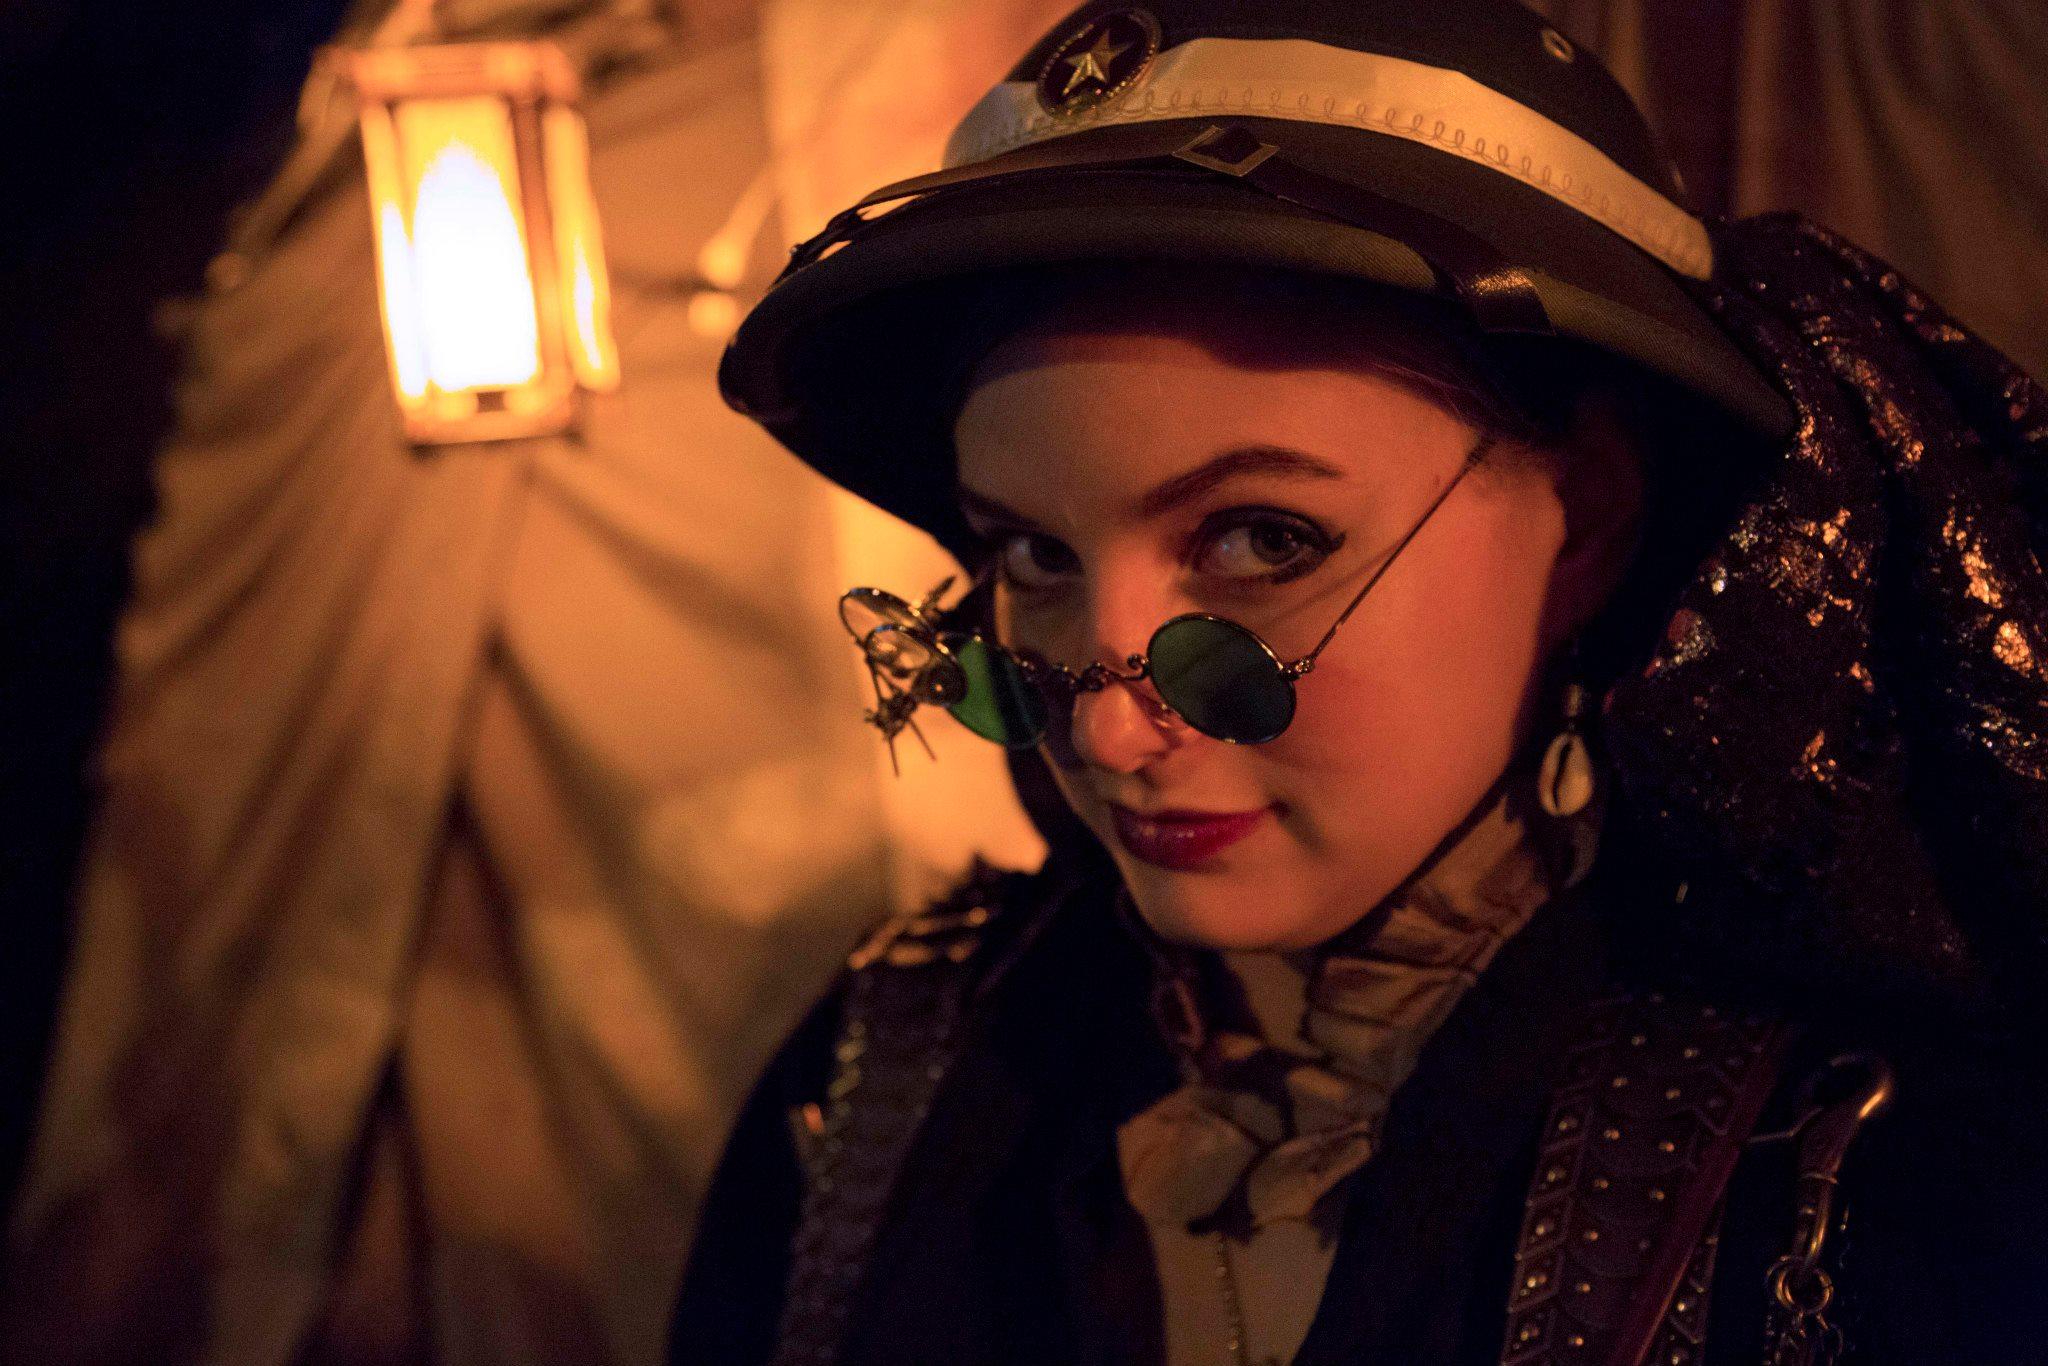 Clara the Adventurer